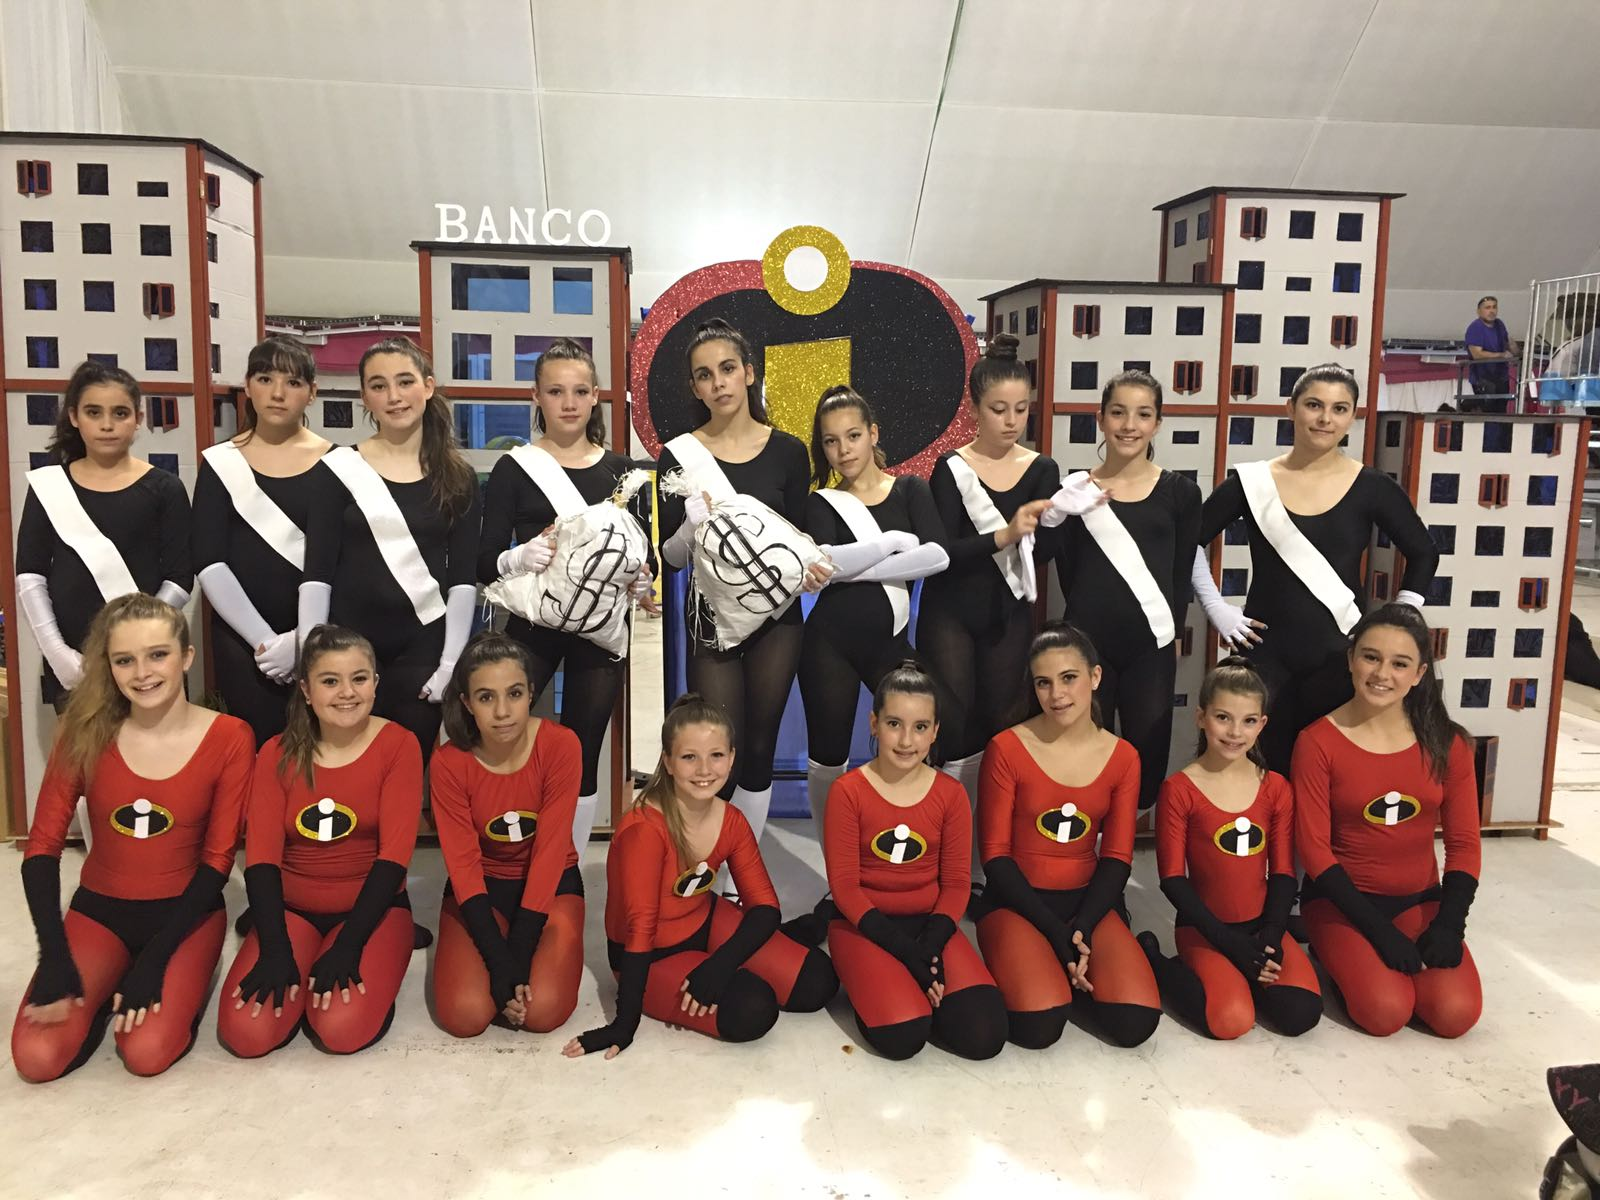 escuela-danza-lia-bailarinas